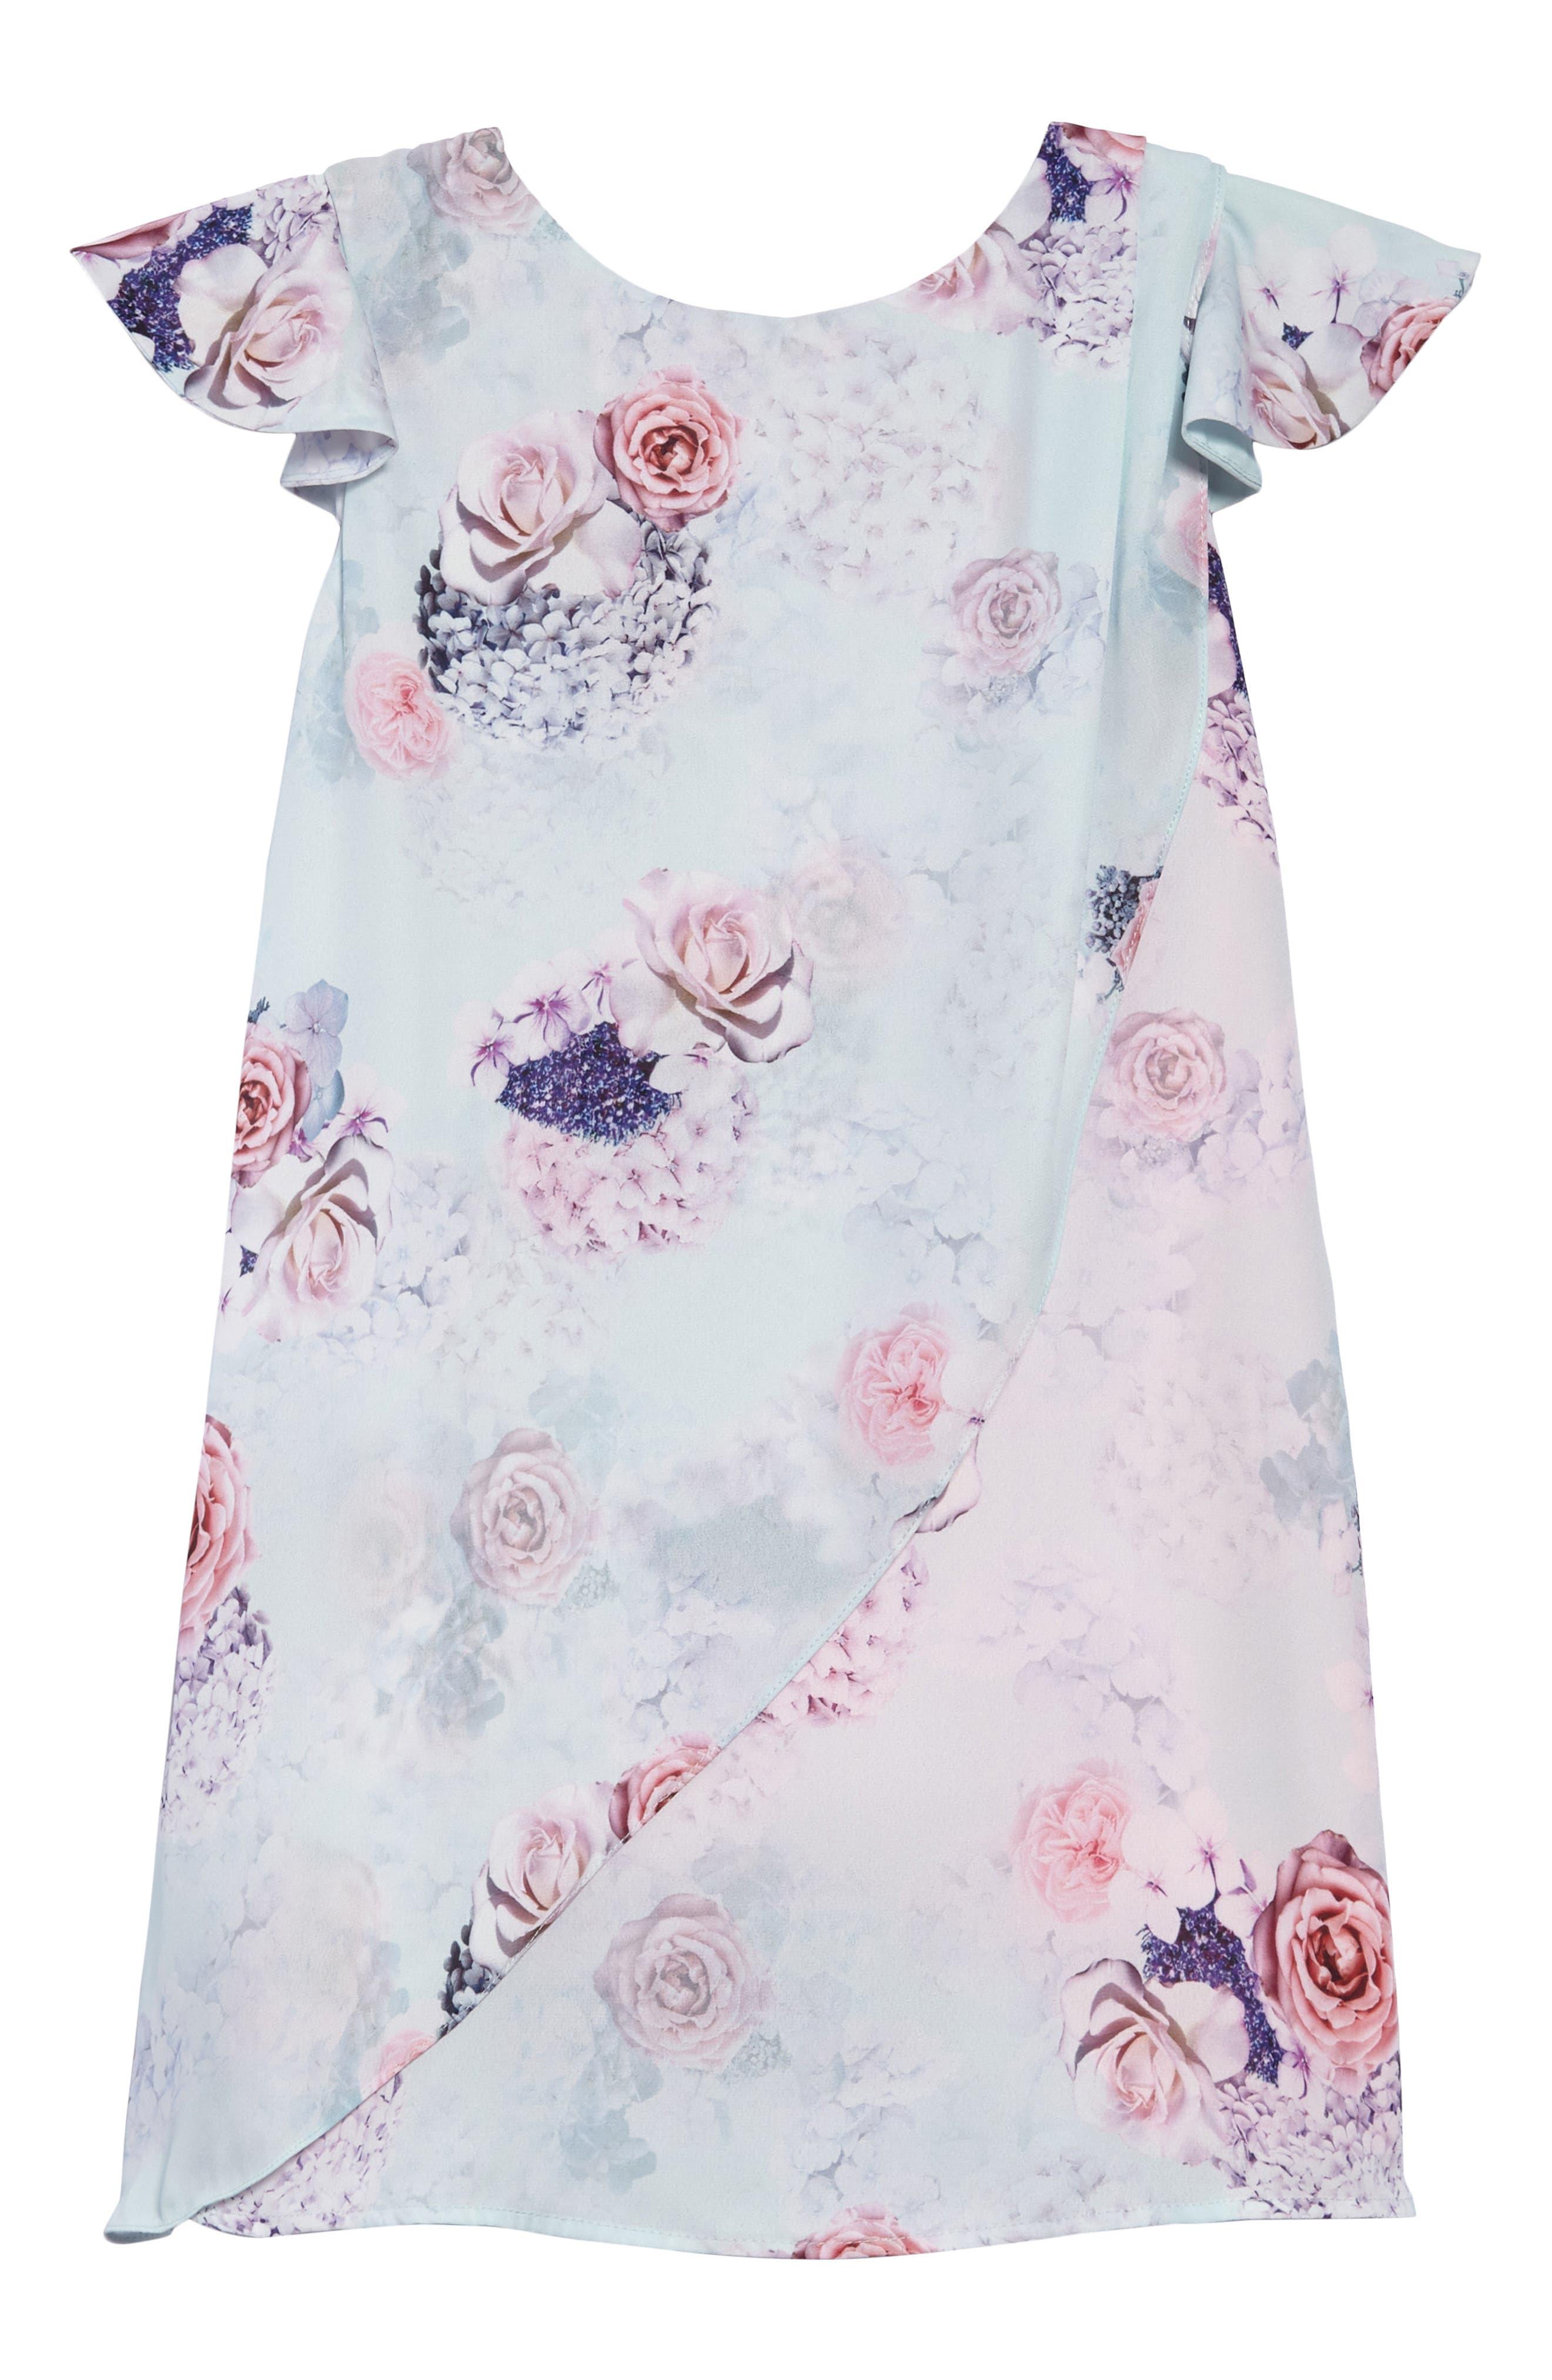 Hermione Chiffon Dress,                             Main thumbnail 1, color,                             300